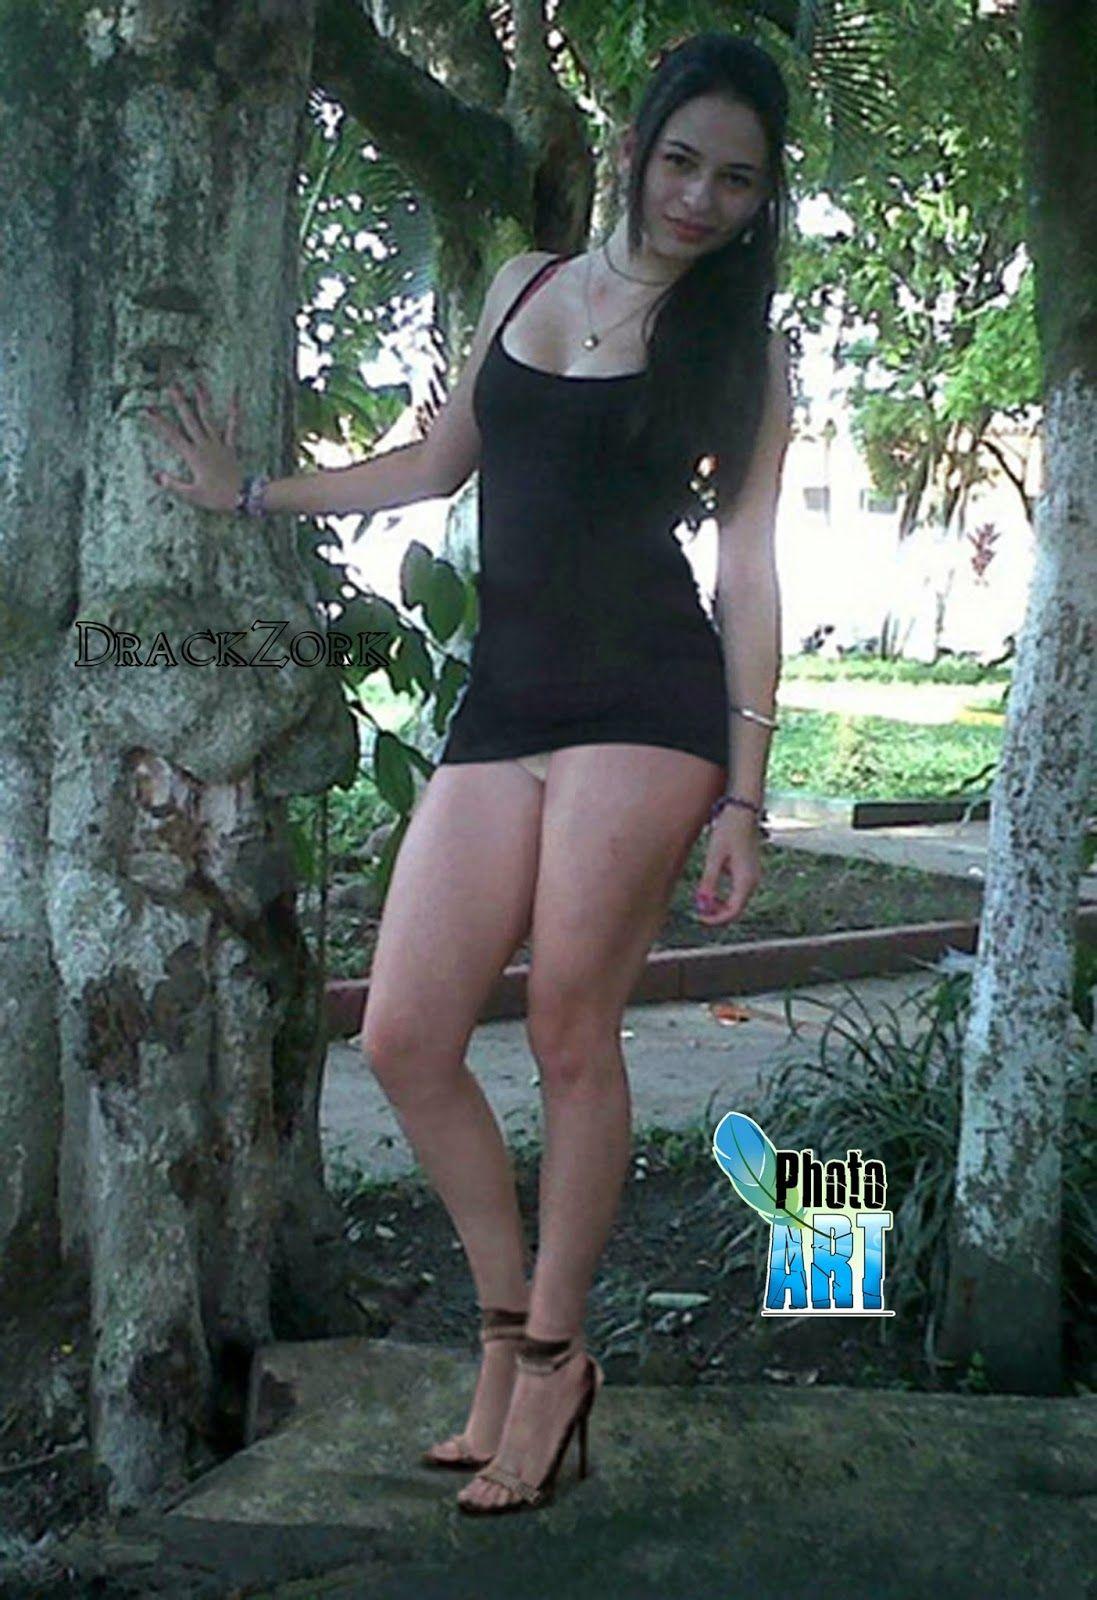 Areliz Mega Upskirt Black Dress Granada Babe Teen Interior Bellisima Hot